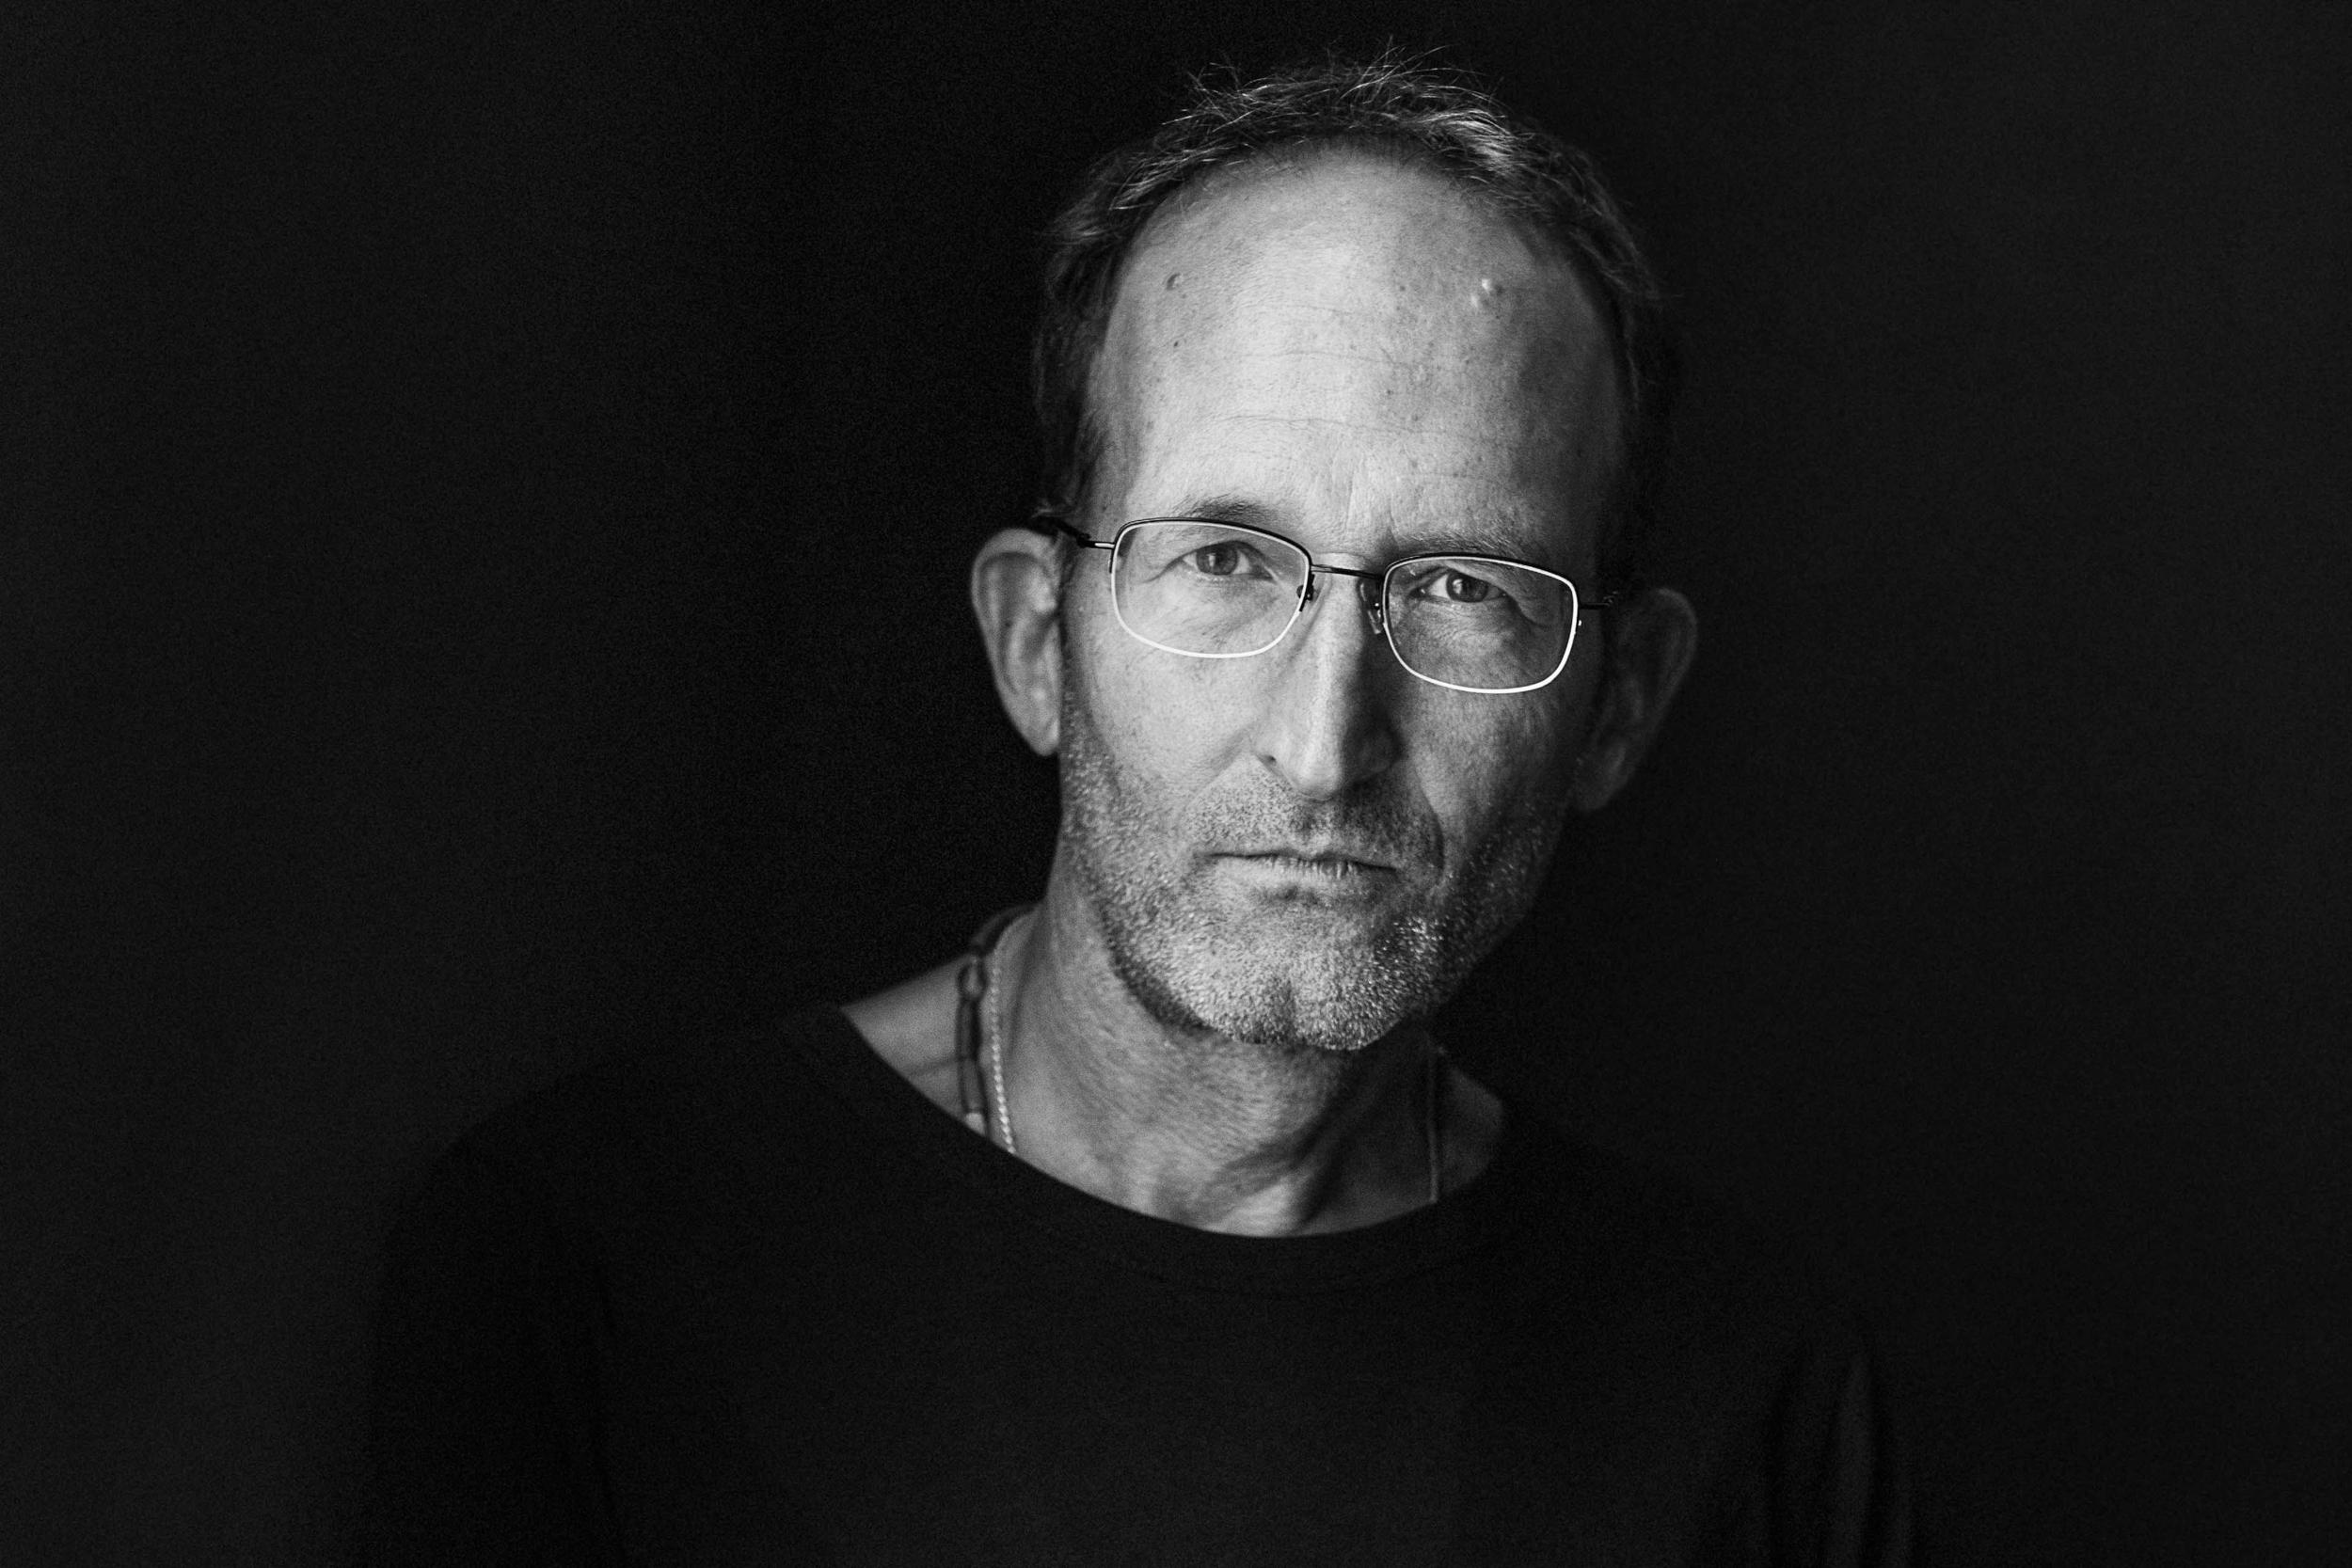 John Zib Headshots Amsterdam Genevieve Chasse Photographer Fotograf Portrait portret 1.jpg